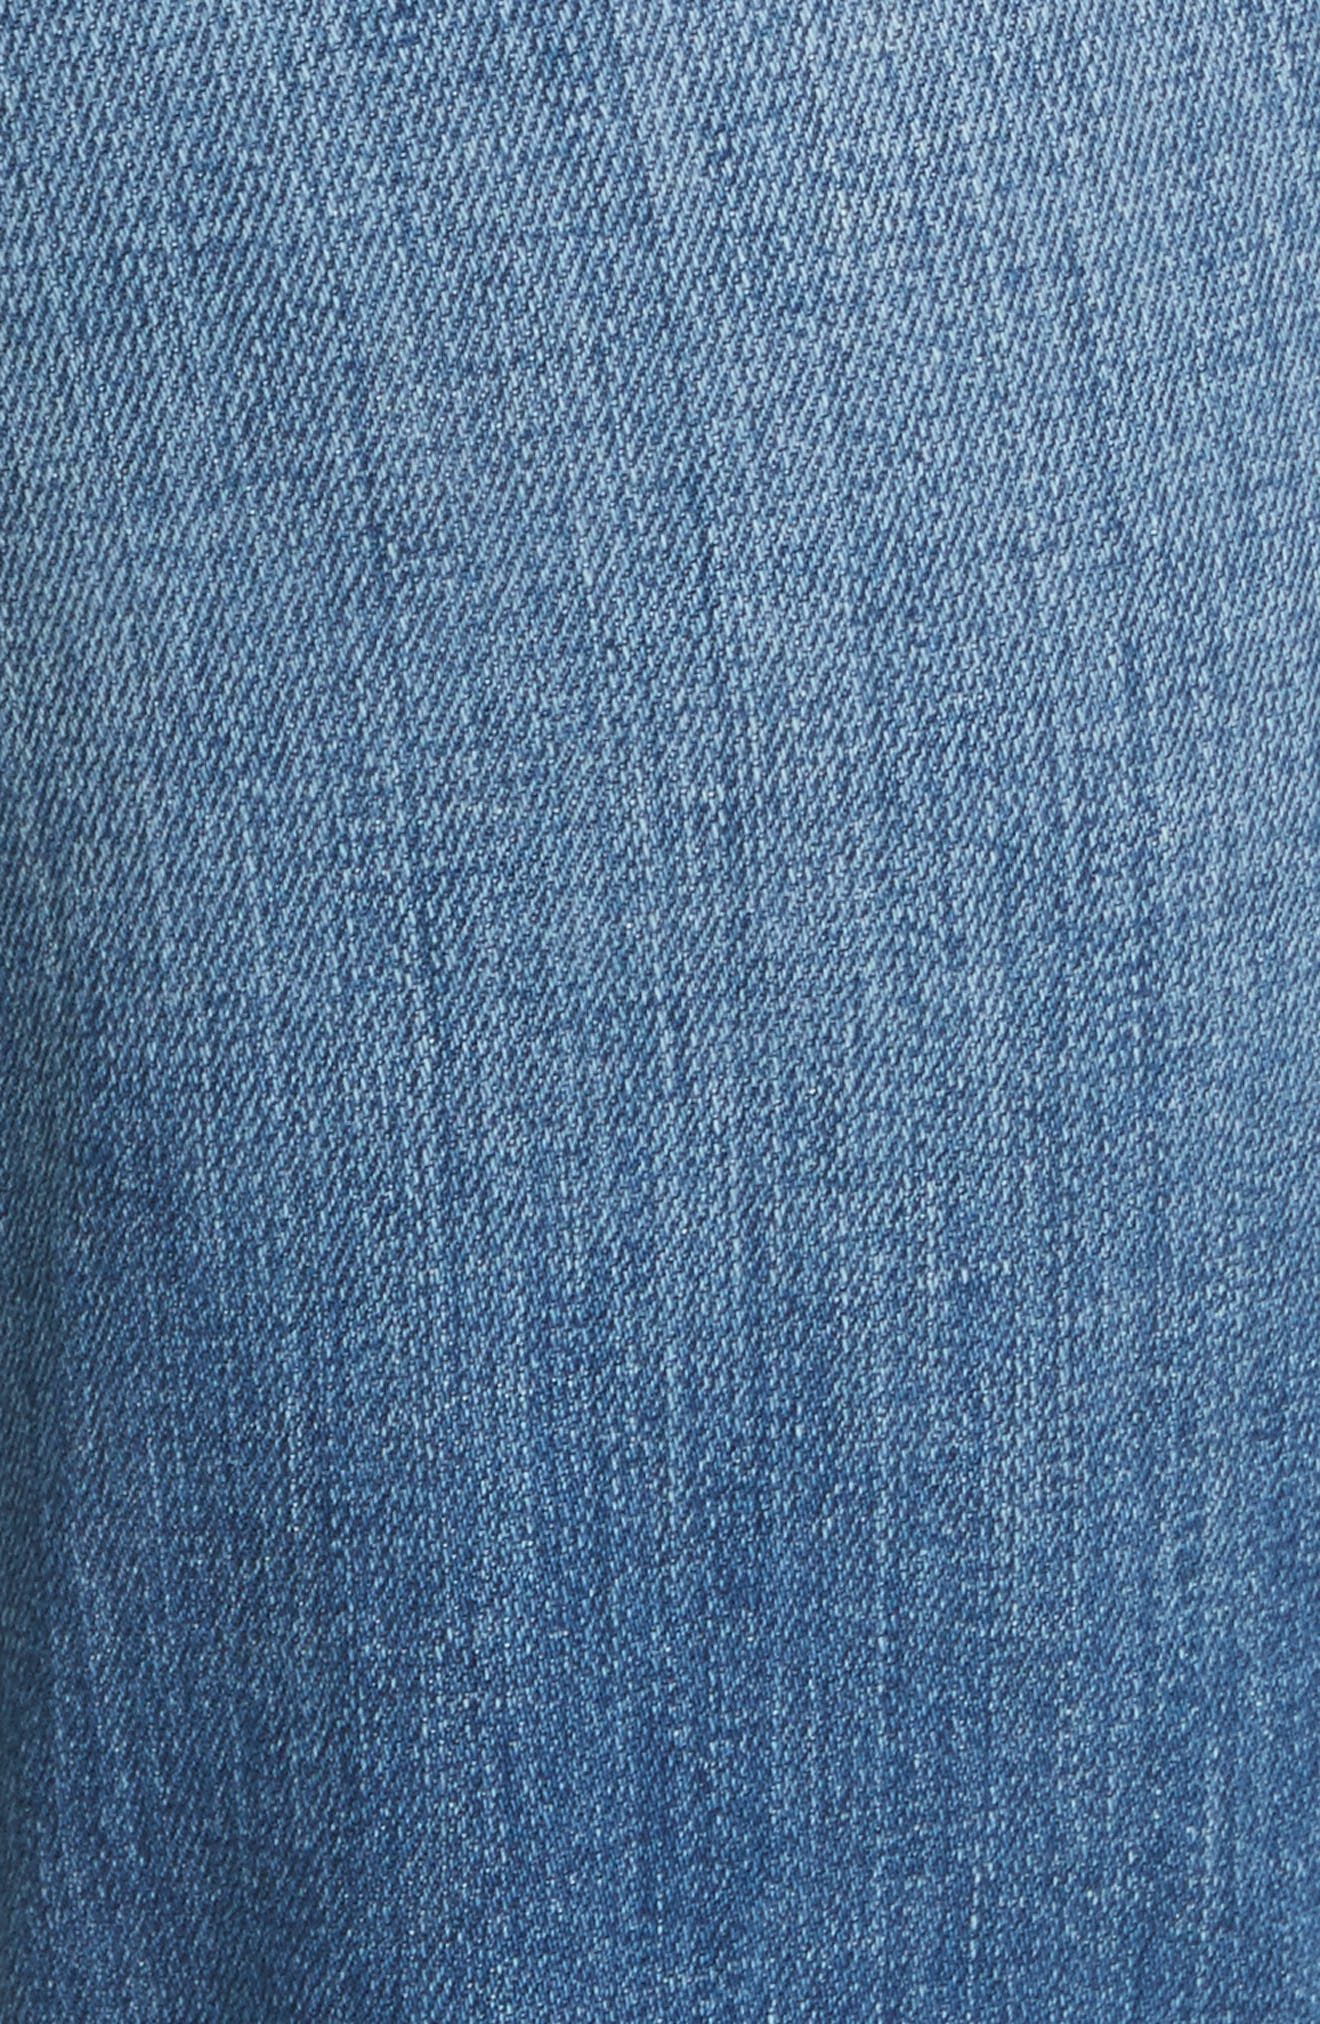 Lorelei High Waist Slim Straight Jeans,                             Alternate thumbnail 6, color,                             450